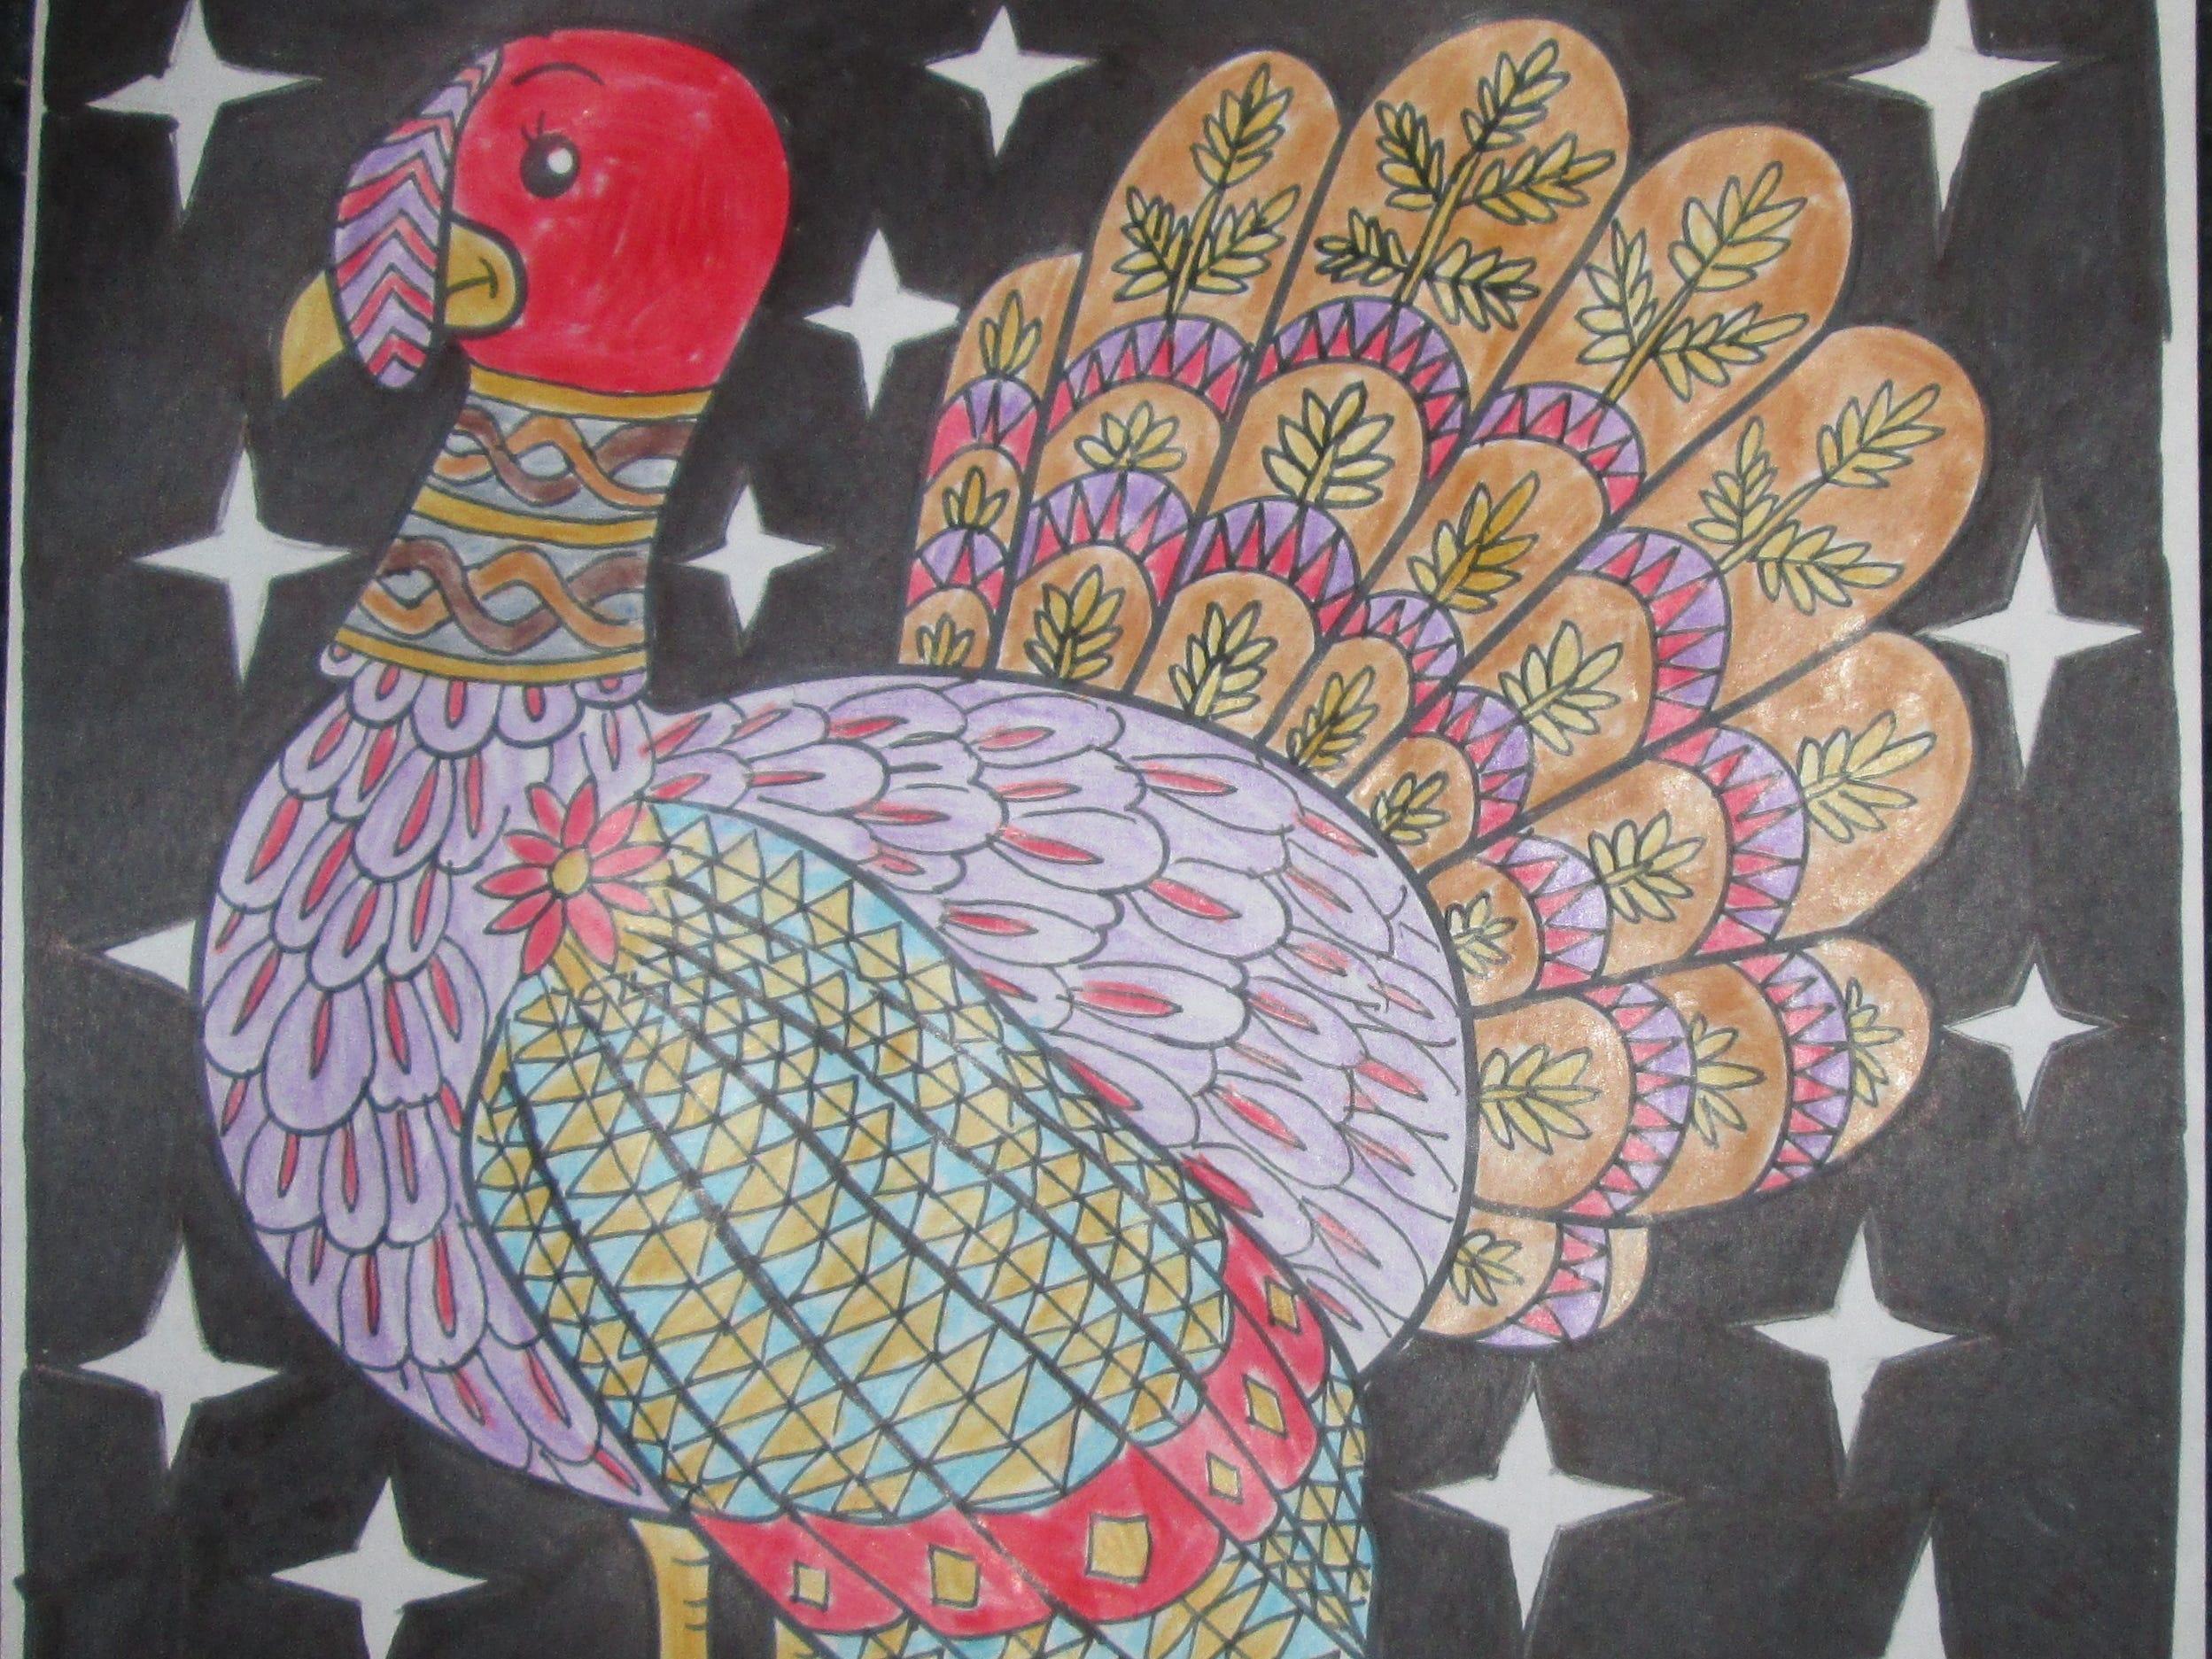 T. De Los Reyes. Dress the Turkey Contest 2018.